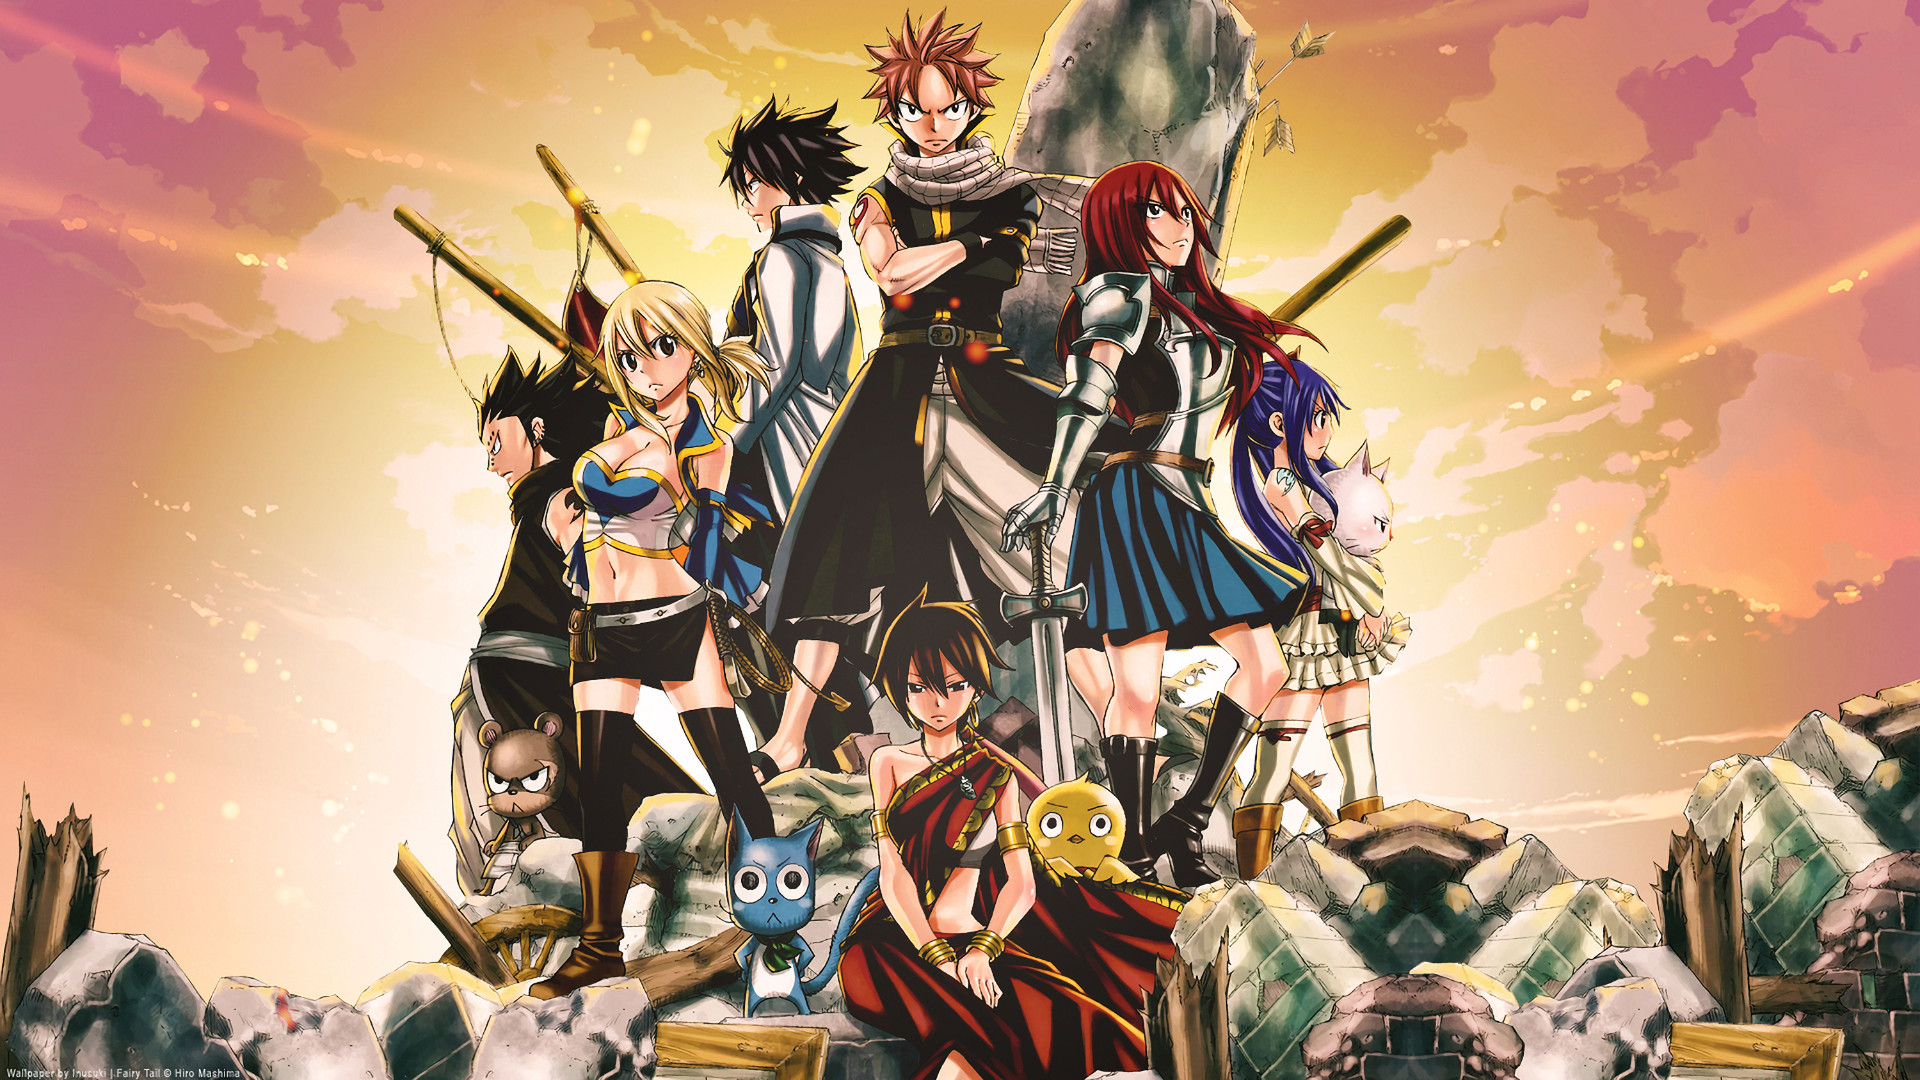 Movie – Fairy Tail the Movie: Phoenix Priestess Anime Lucy Heartfilia Natsu  Dragneel Erza Scarlet